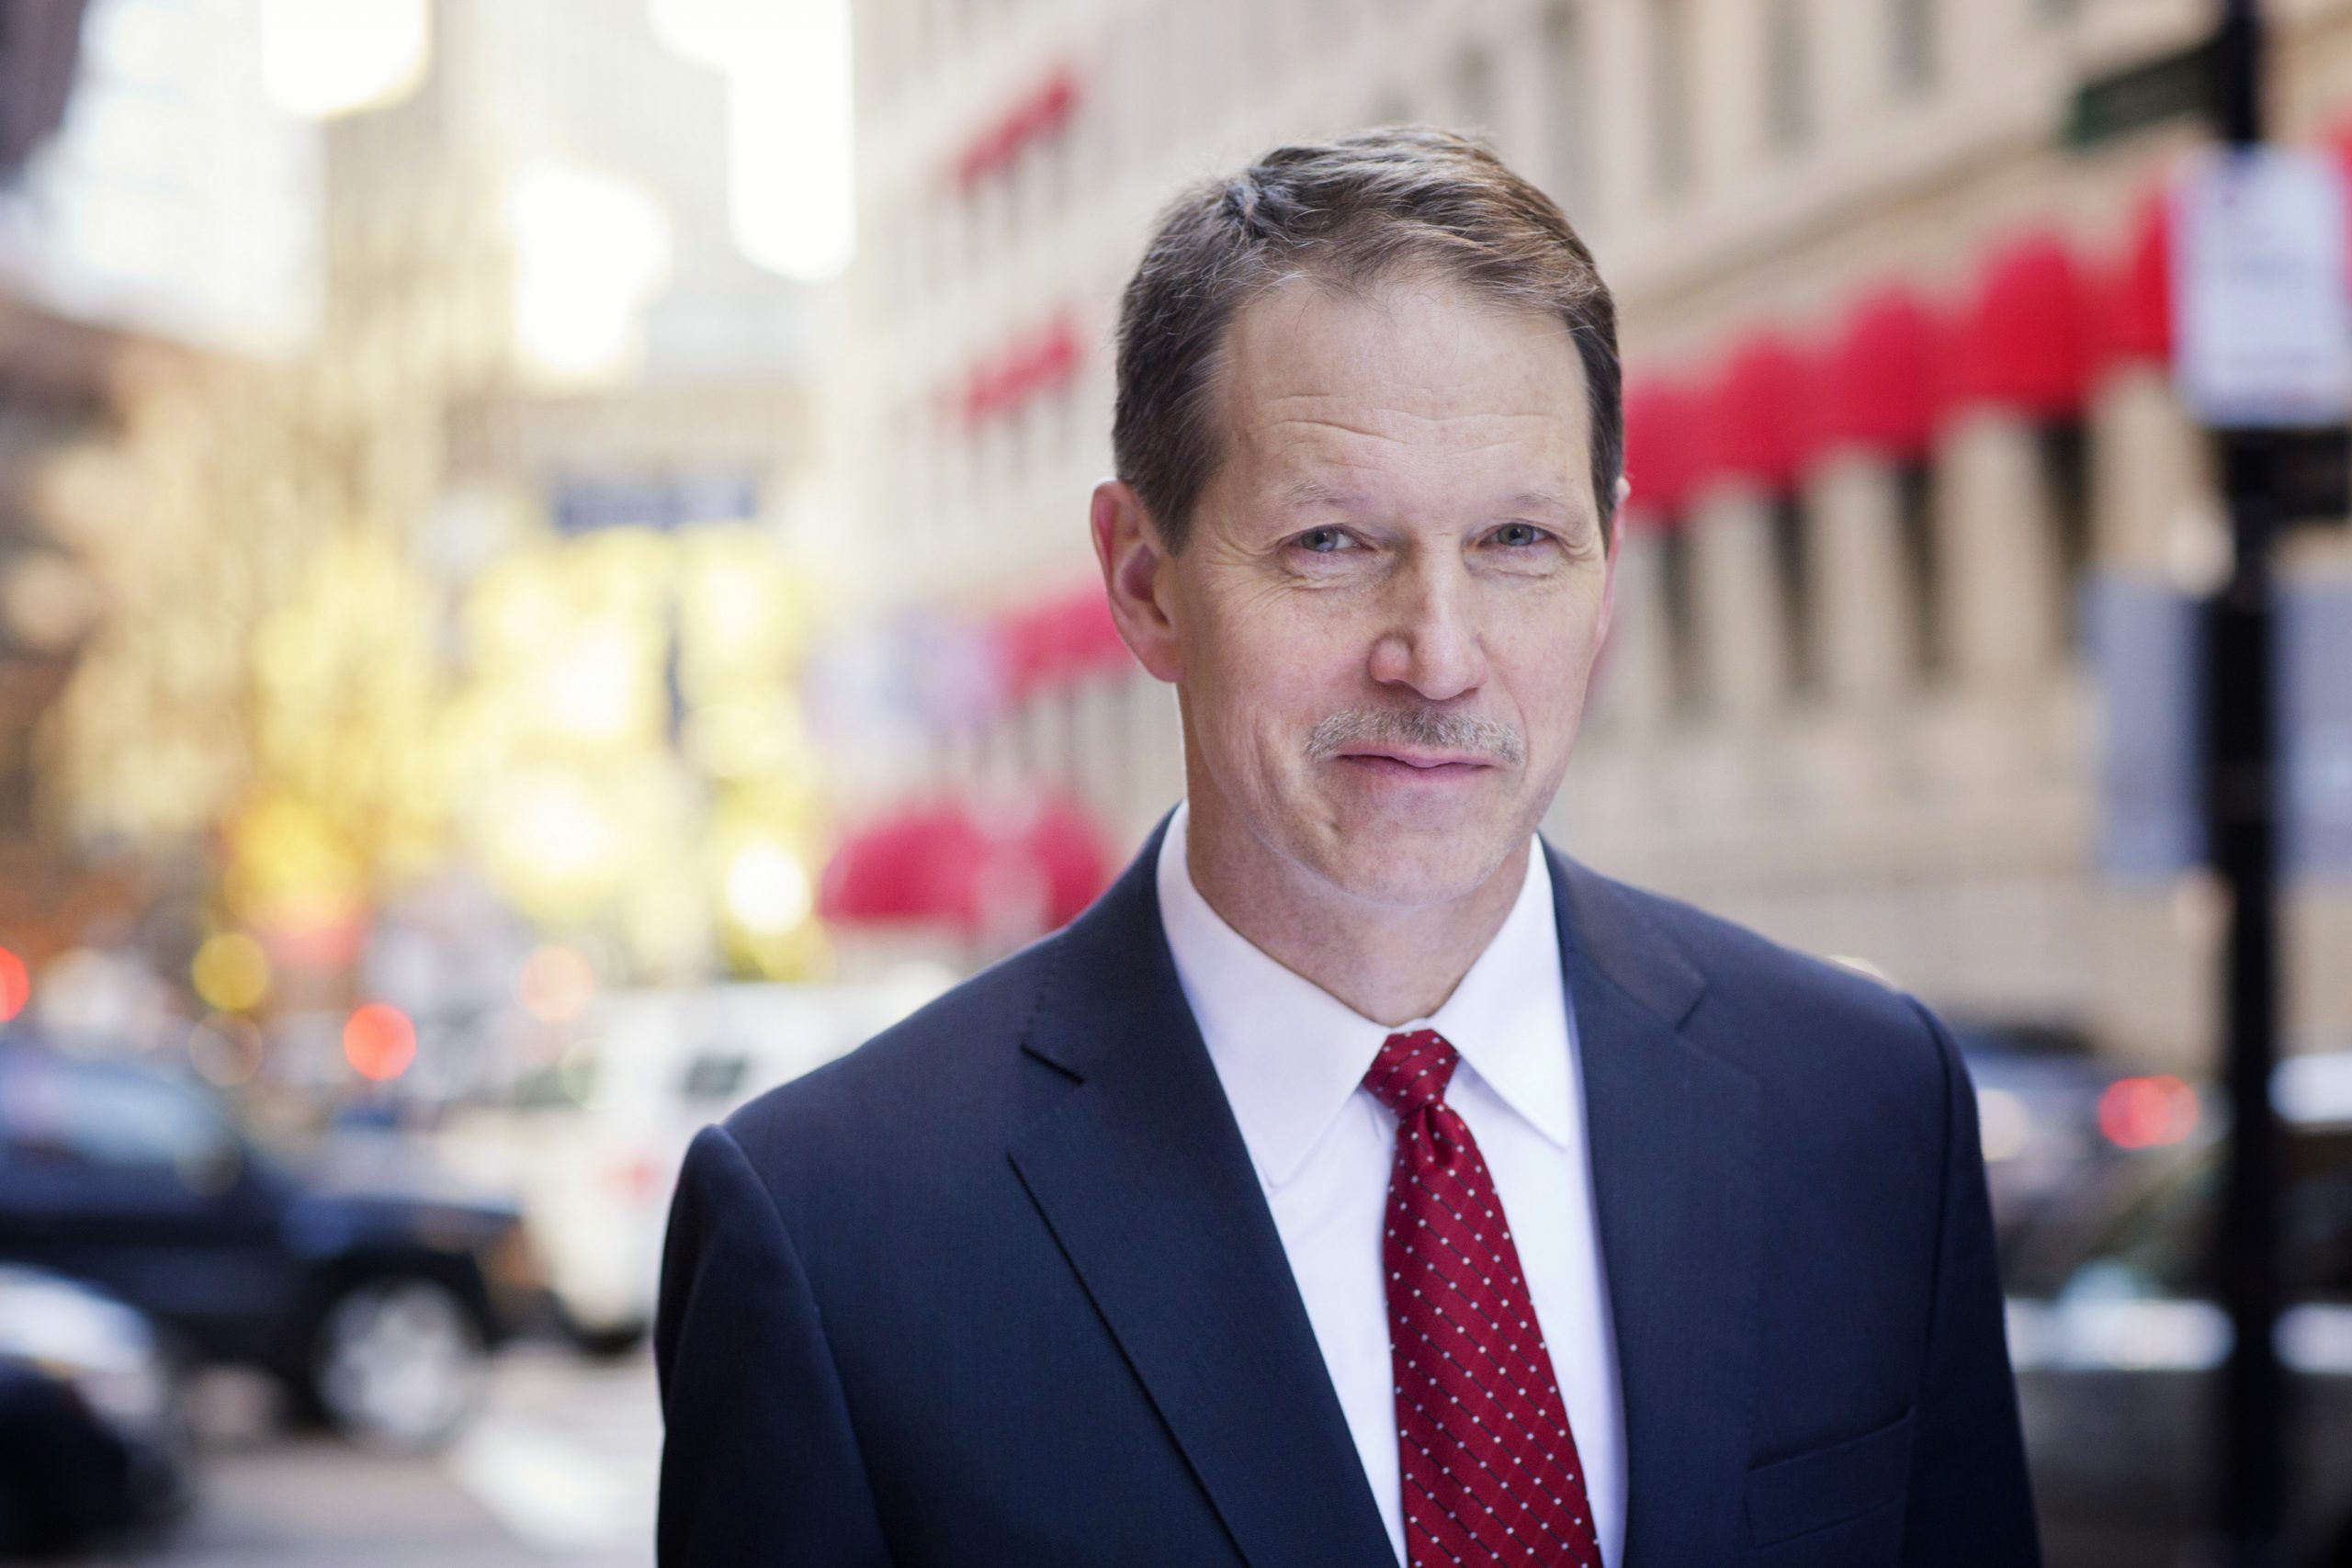 Hubbard R. Garber, CFA, CFP Managing Director at Barrington Partners